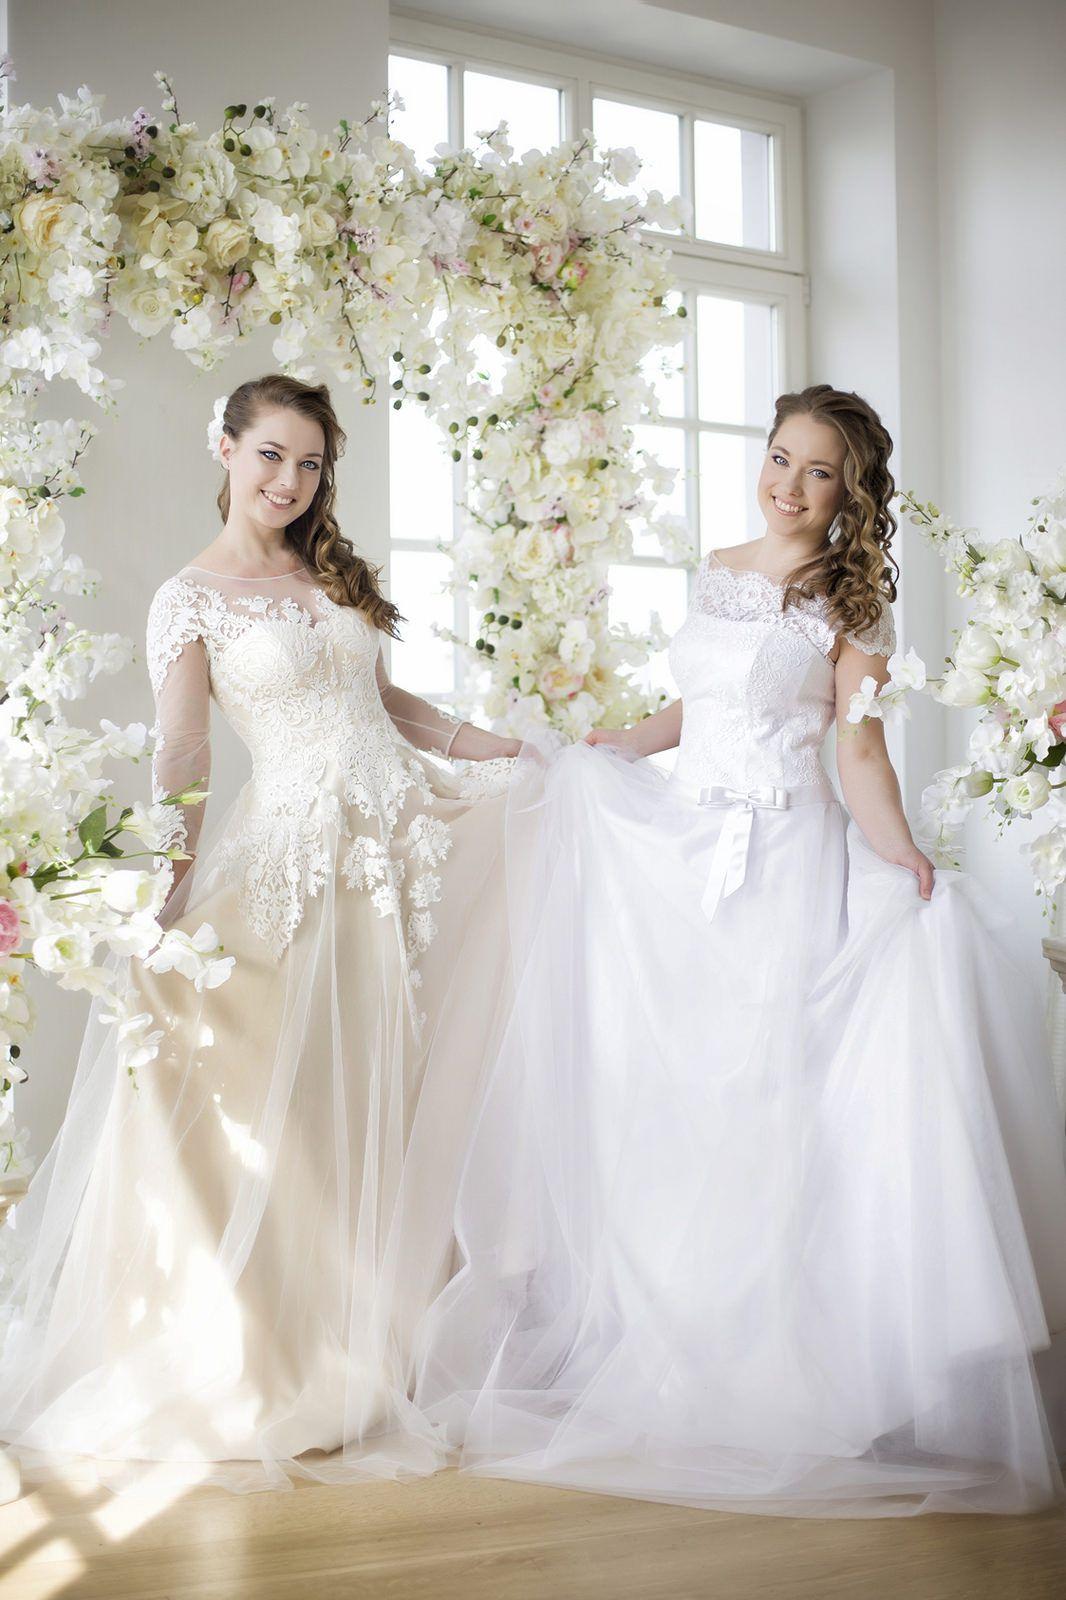 20170402_bride_sessions_11 bride flower girl dresses